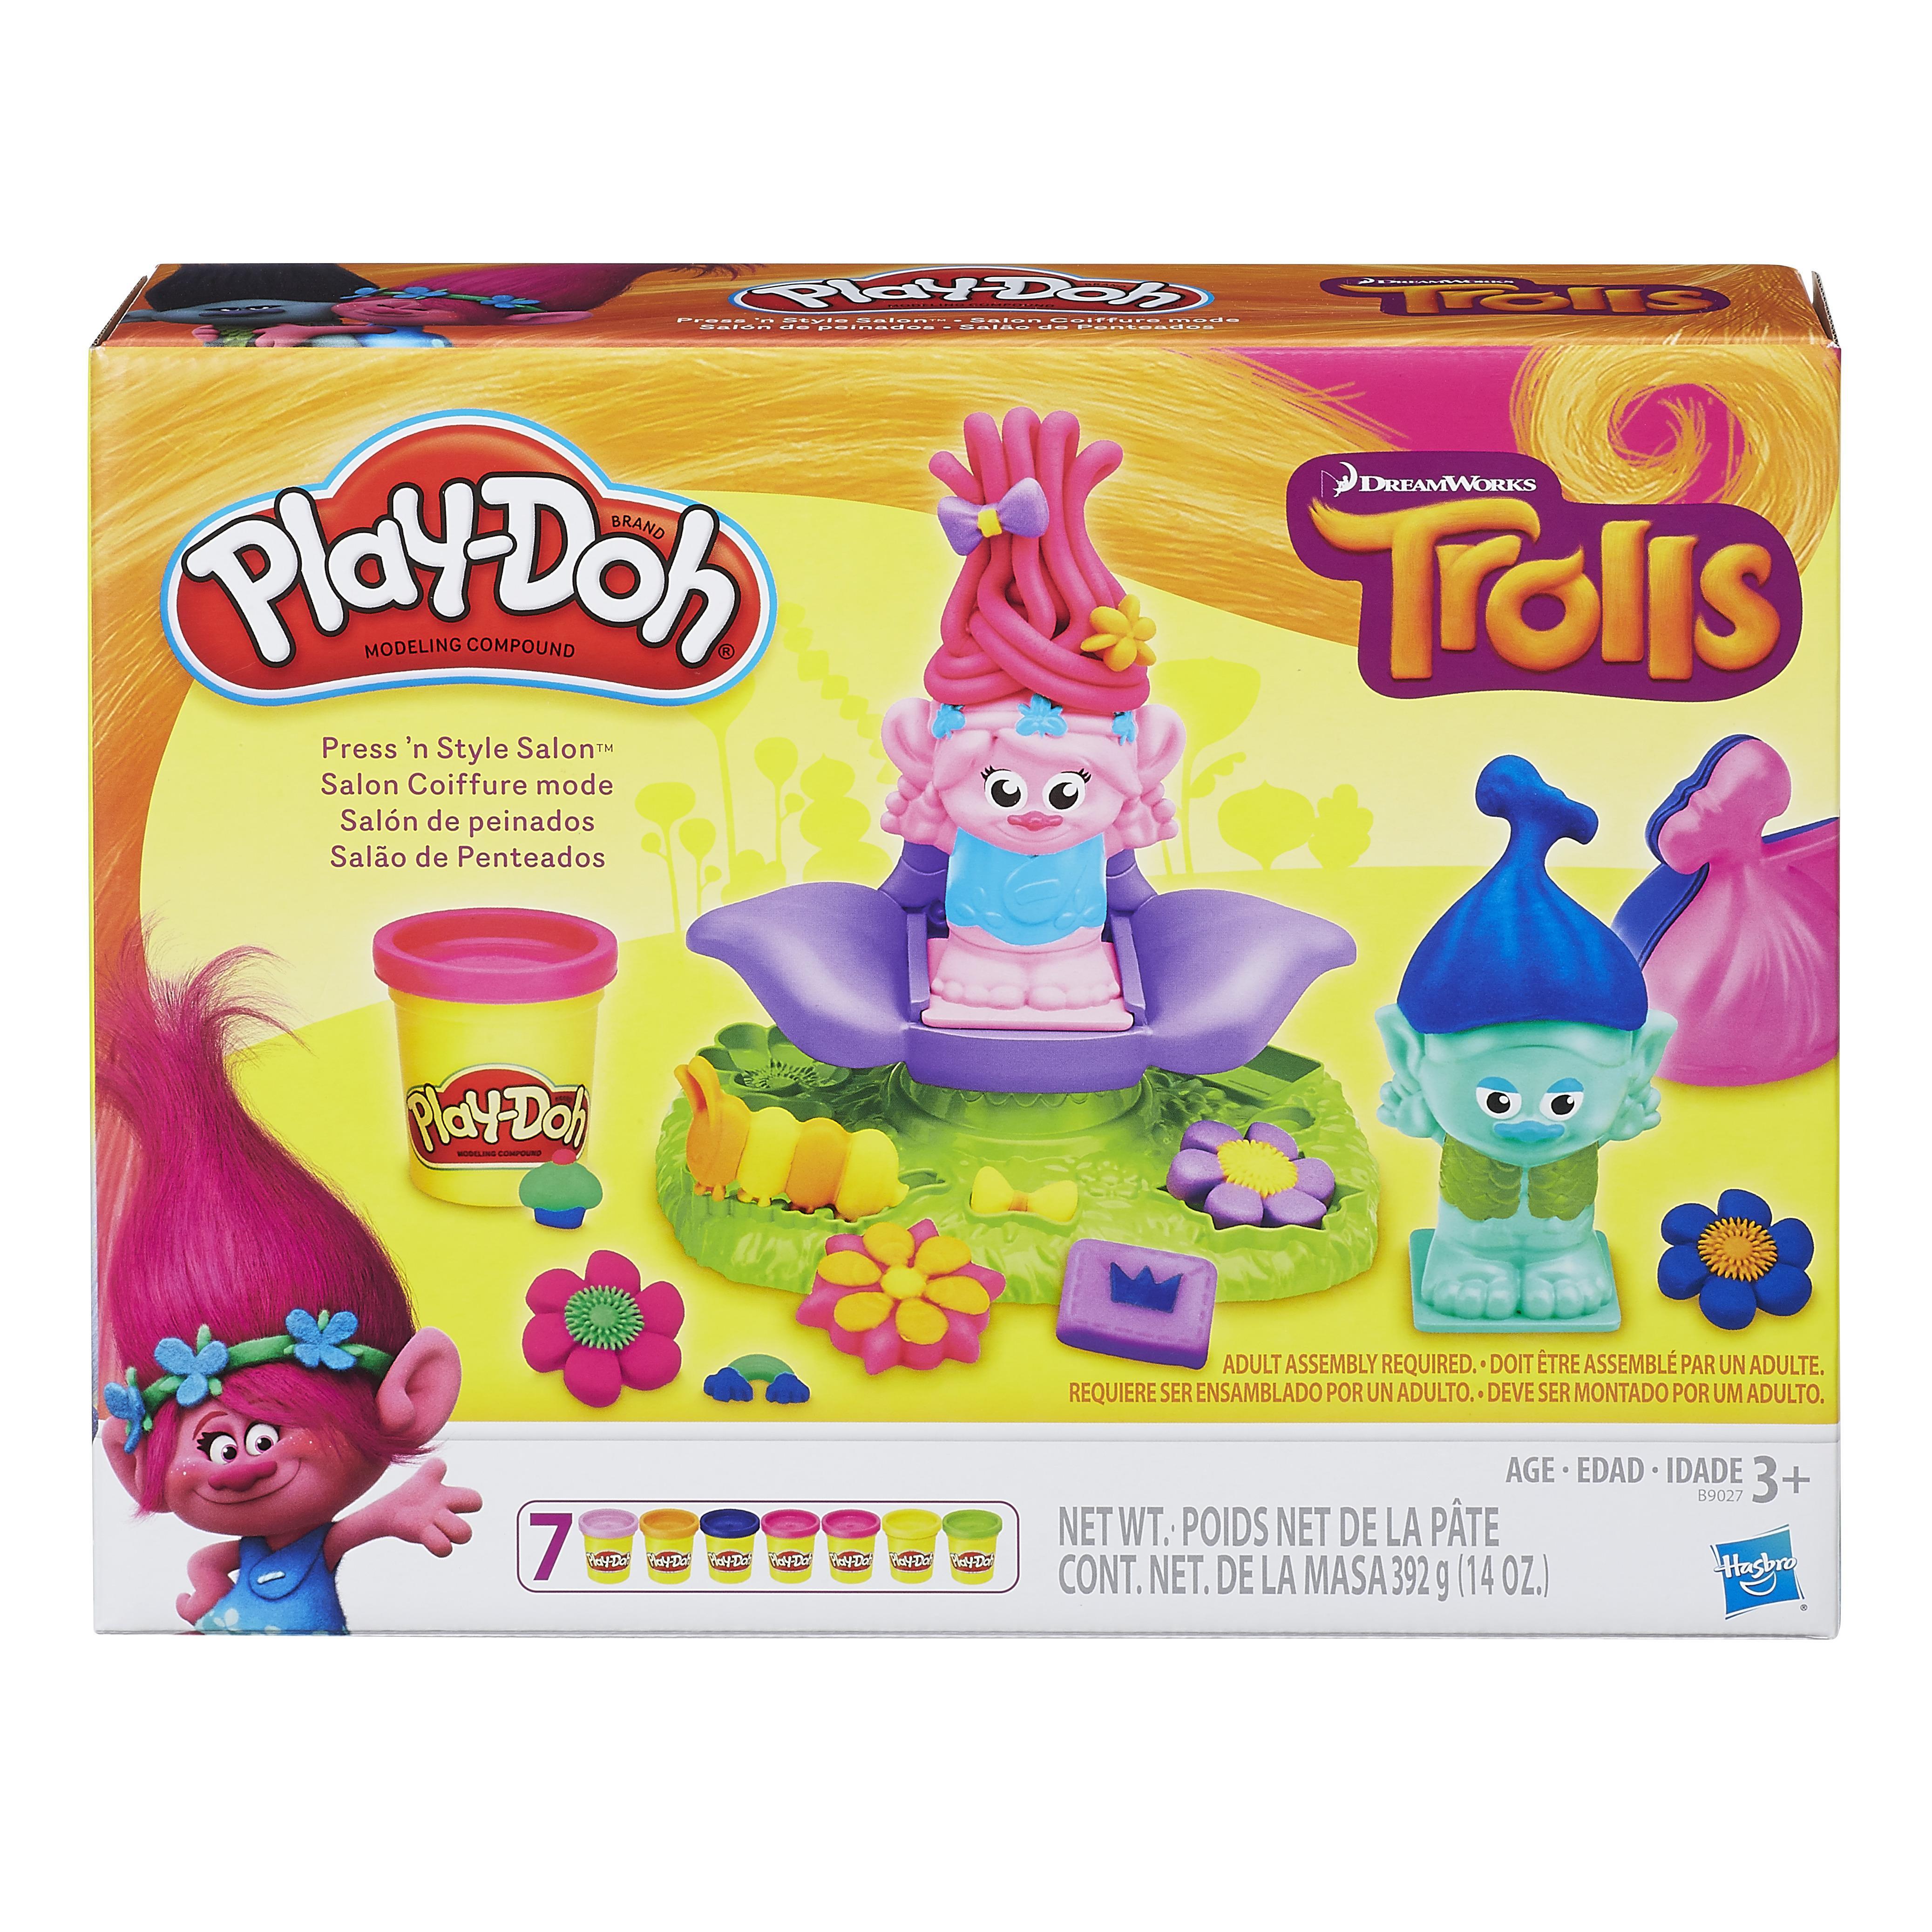 Play Toys Com : Amazon play doh dreamworks trolls press n style